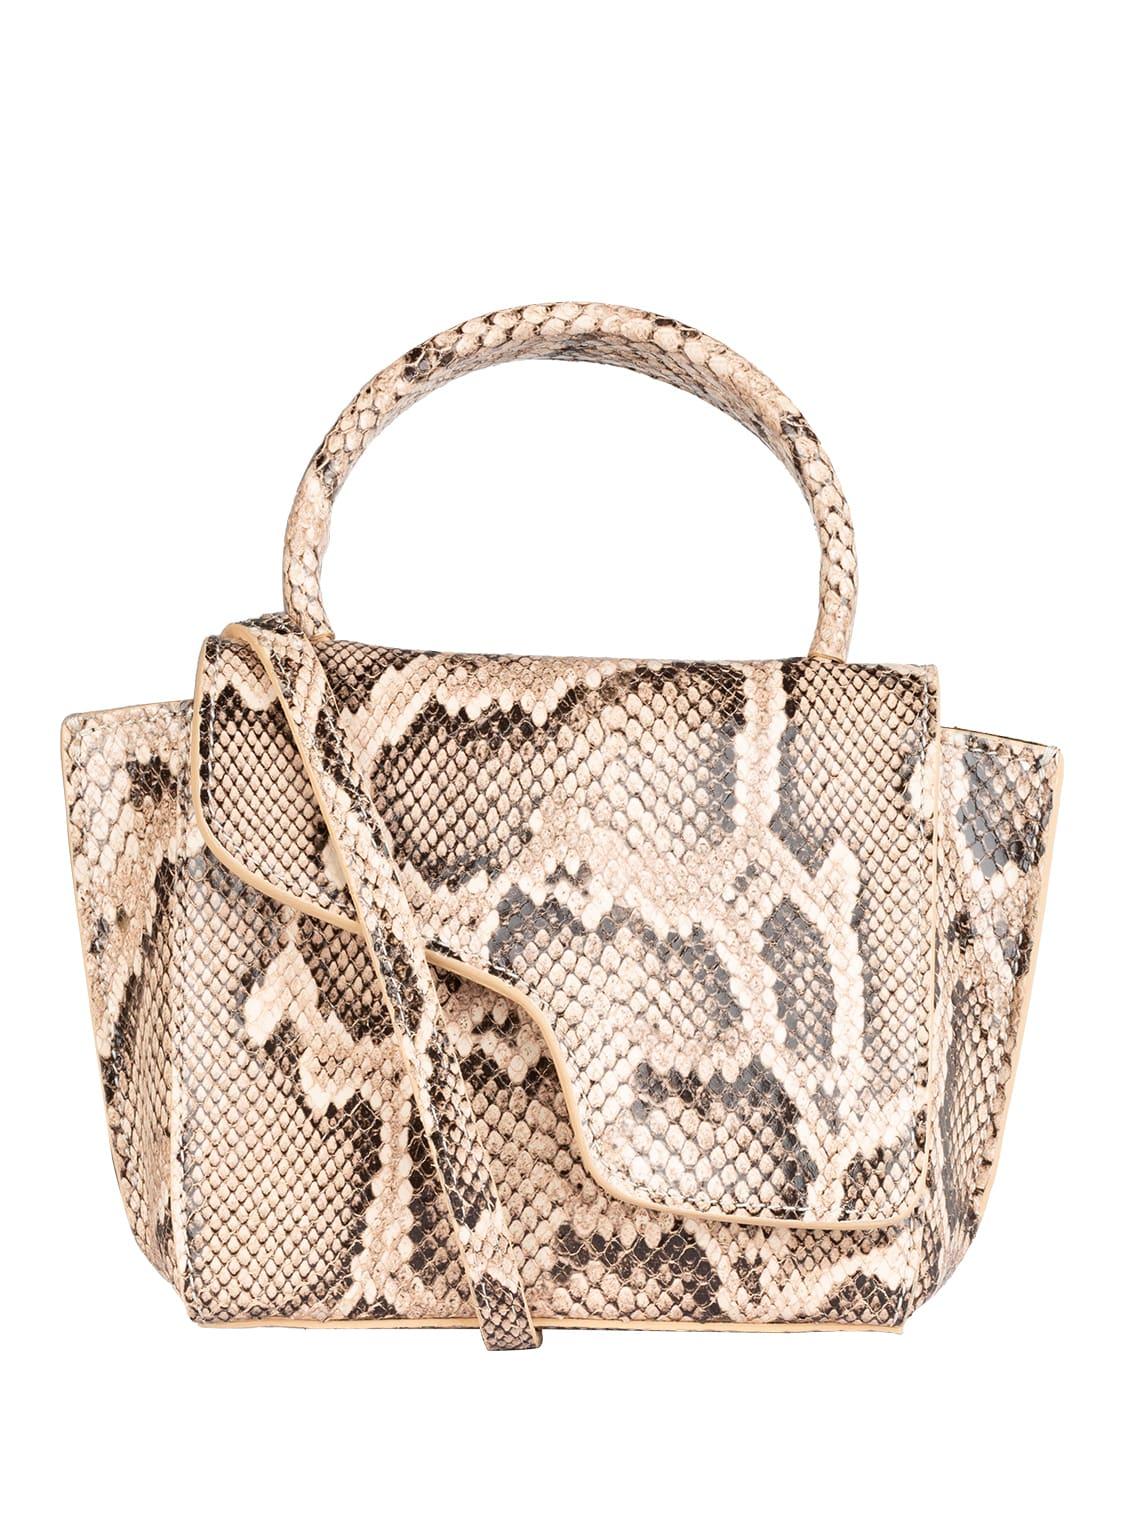 Image of Atp Atelier Micro Bag Montalcino beige